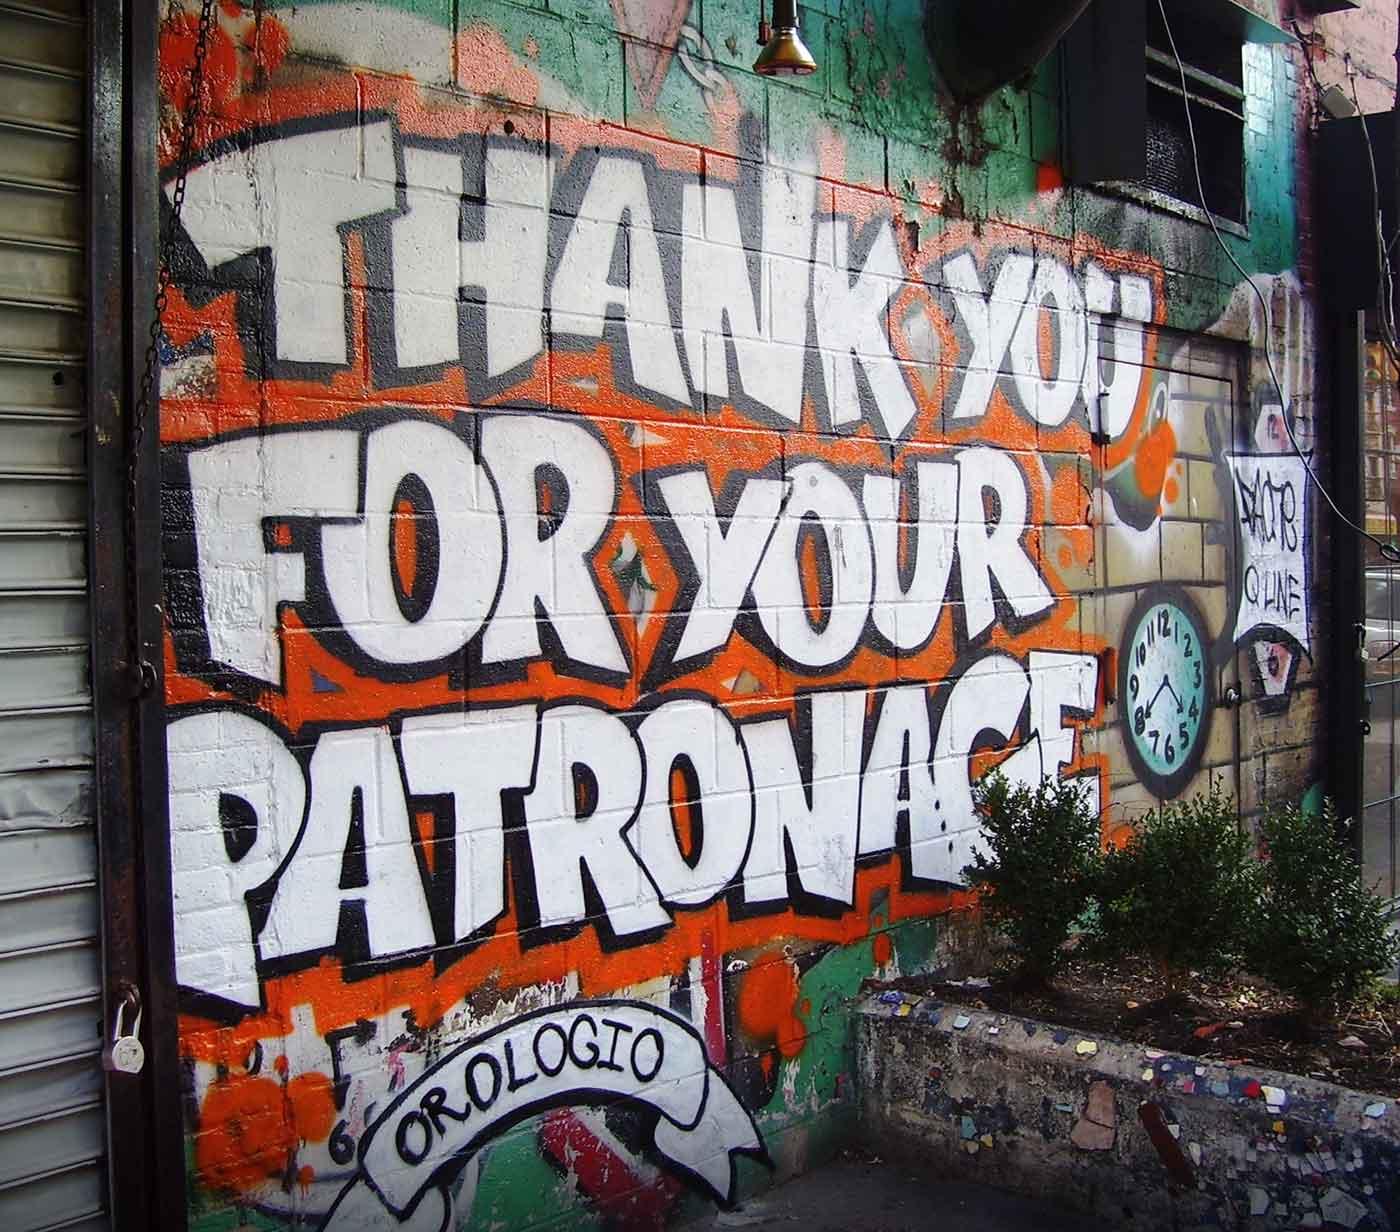 Patronage sign